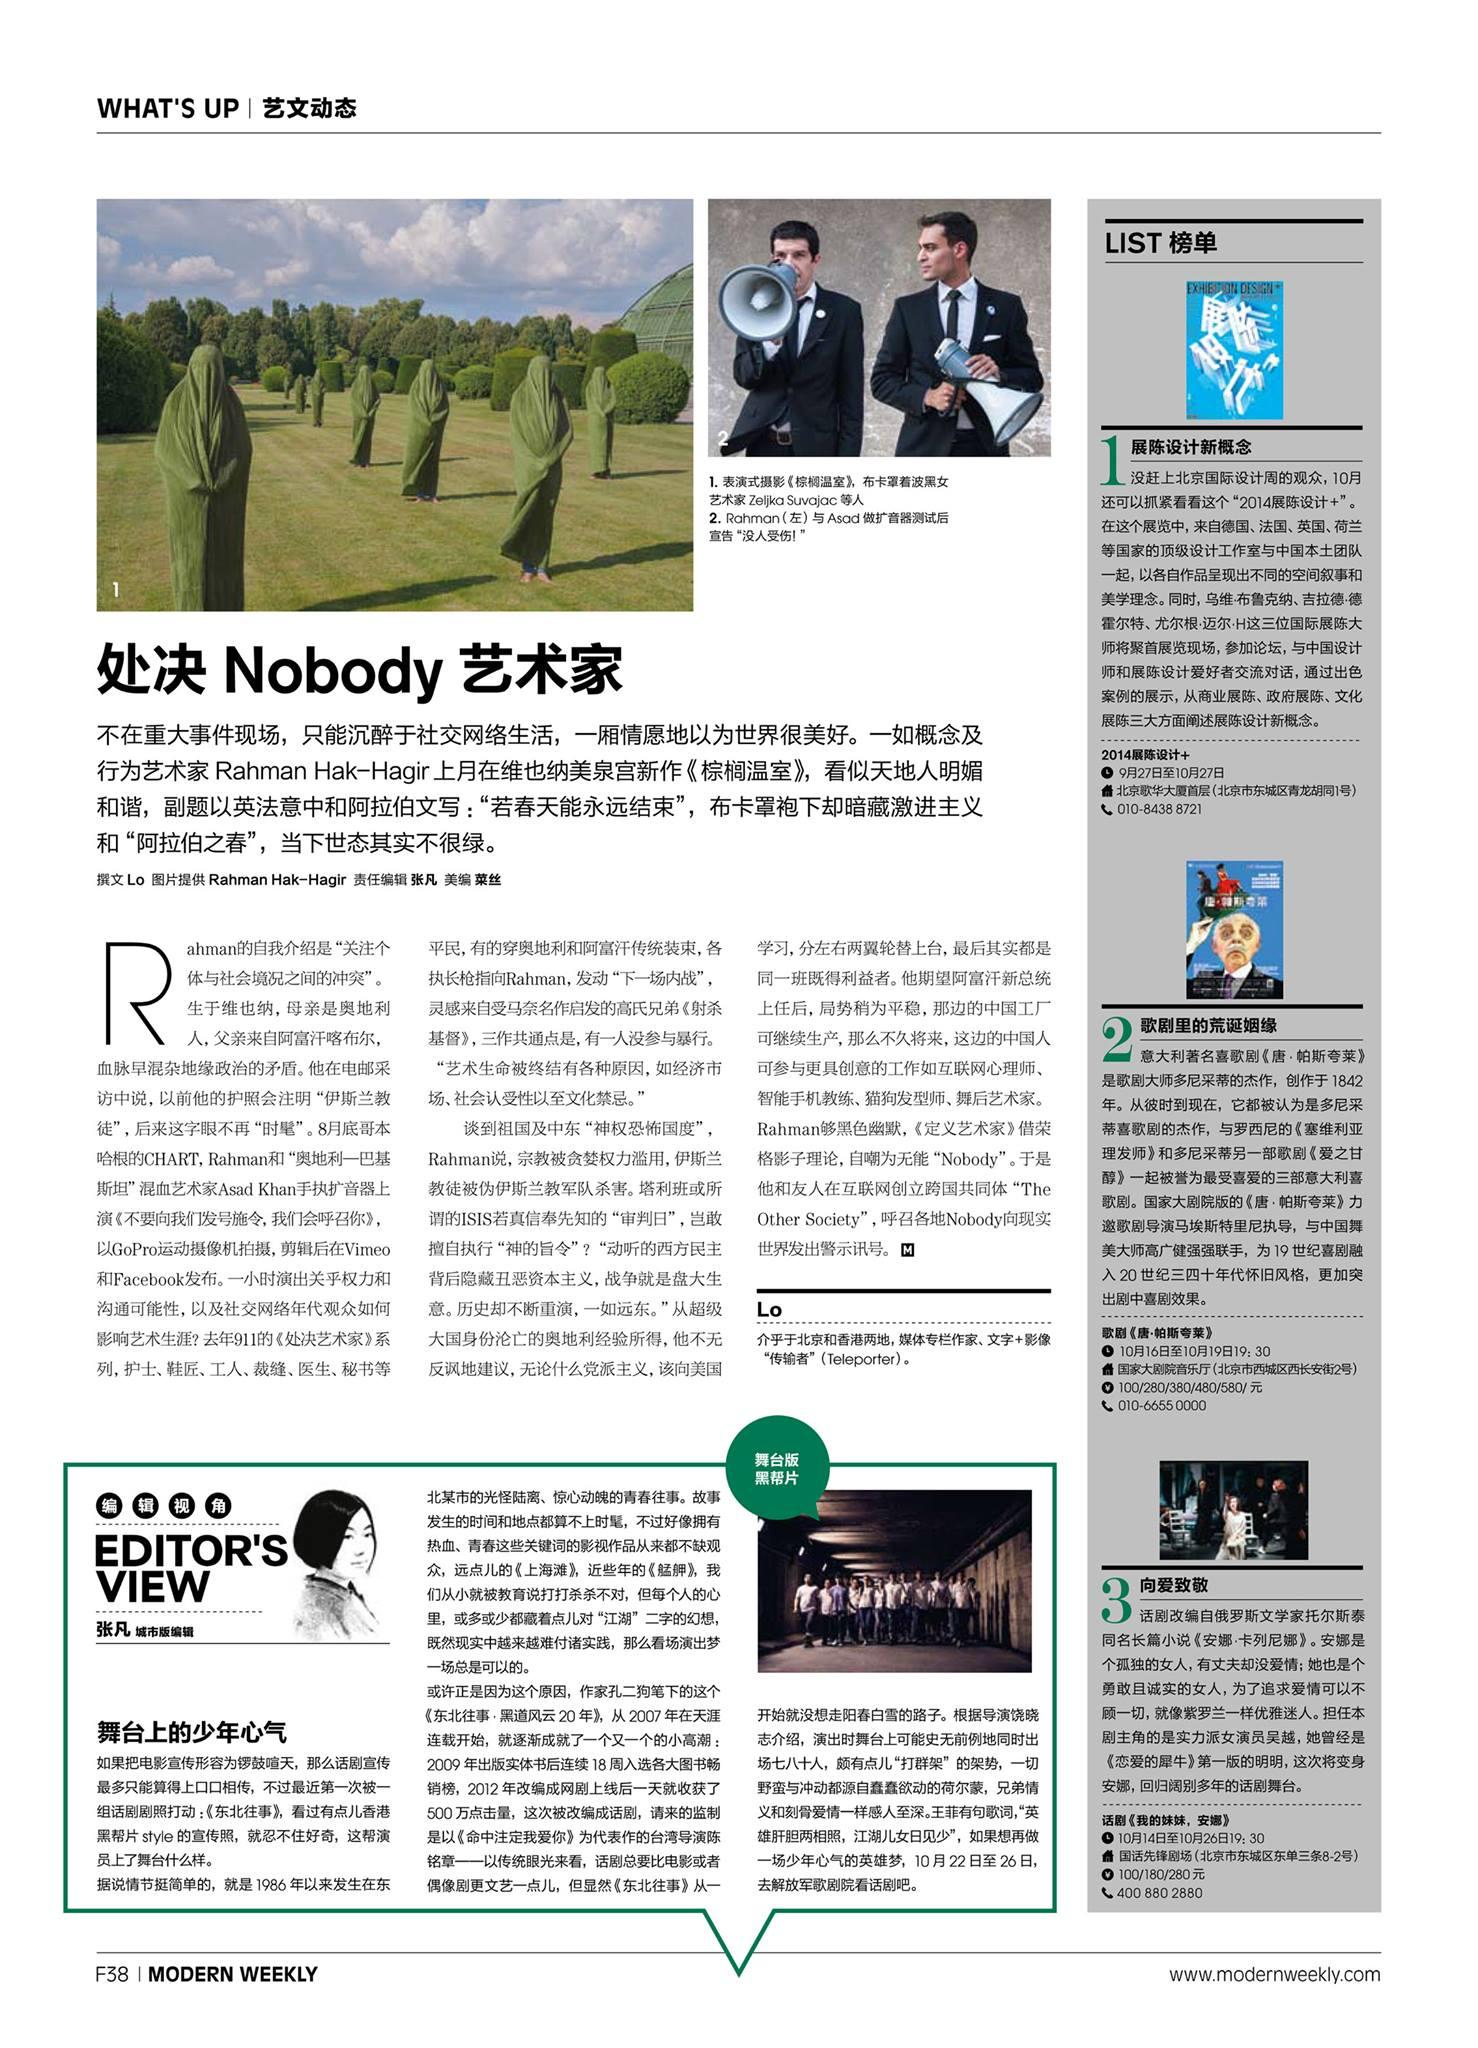 Rahman Hak-Hagir - Modern Weekly, Beijing (2014)